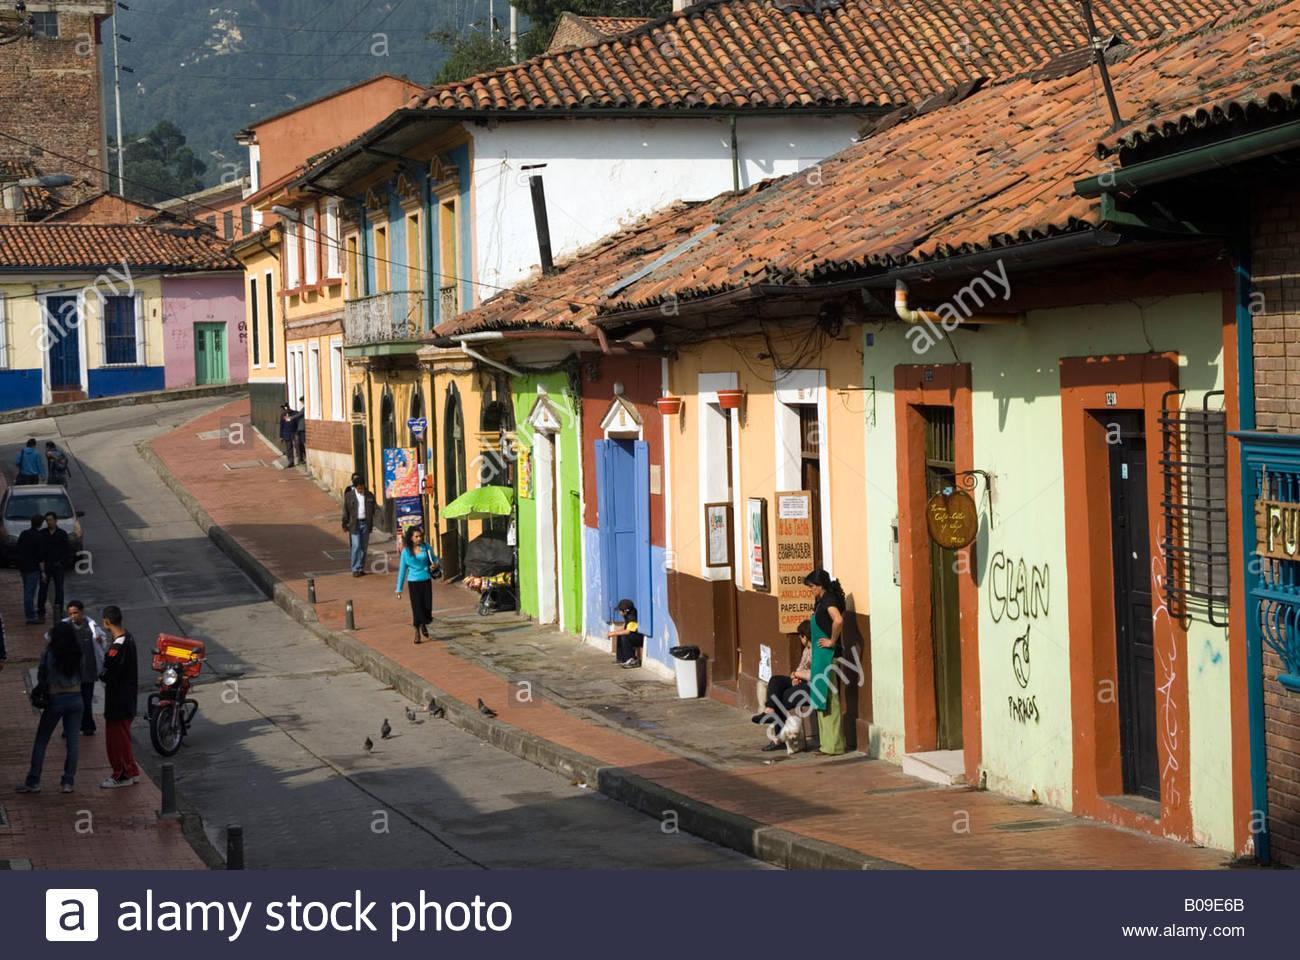 Dans la rue, La Candelaria Bogota, Colombie Photo Stock